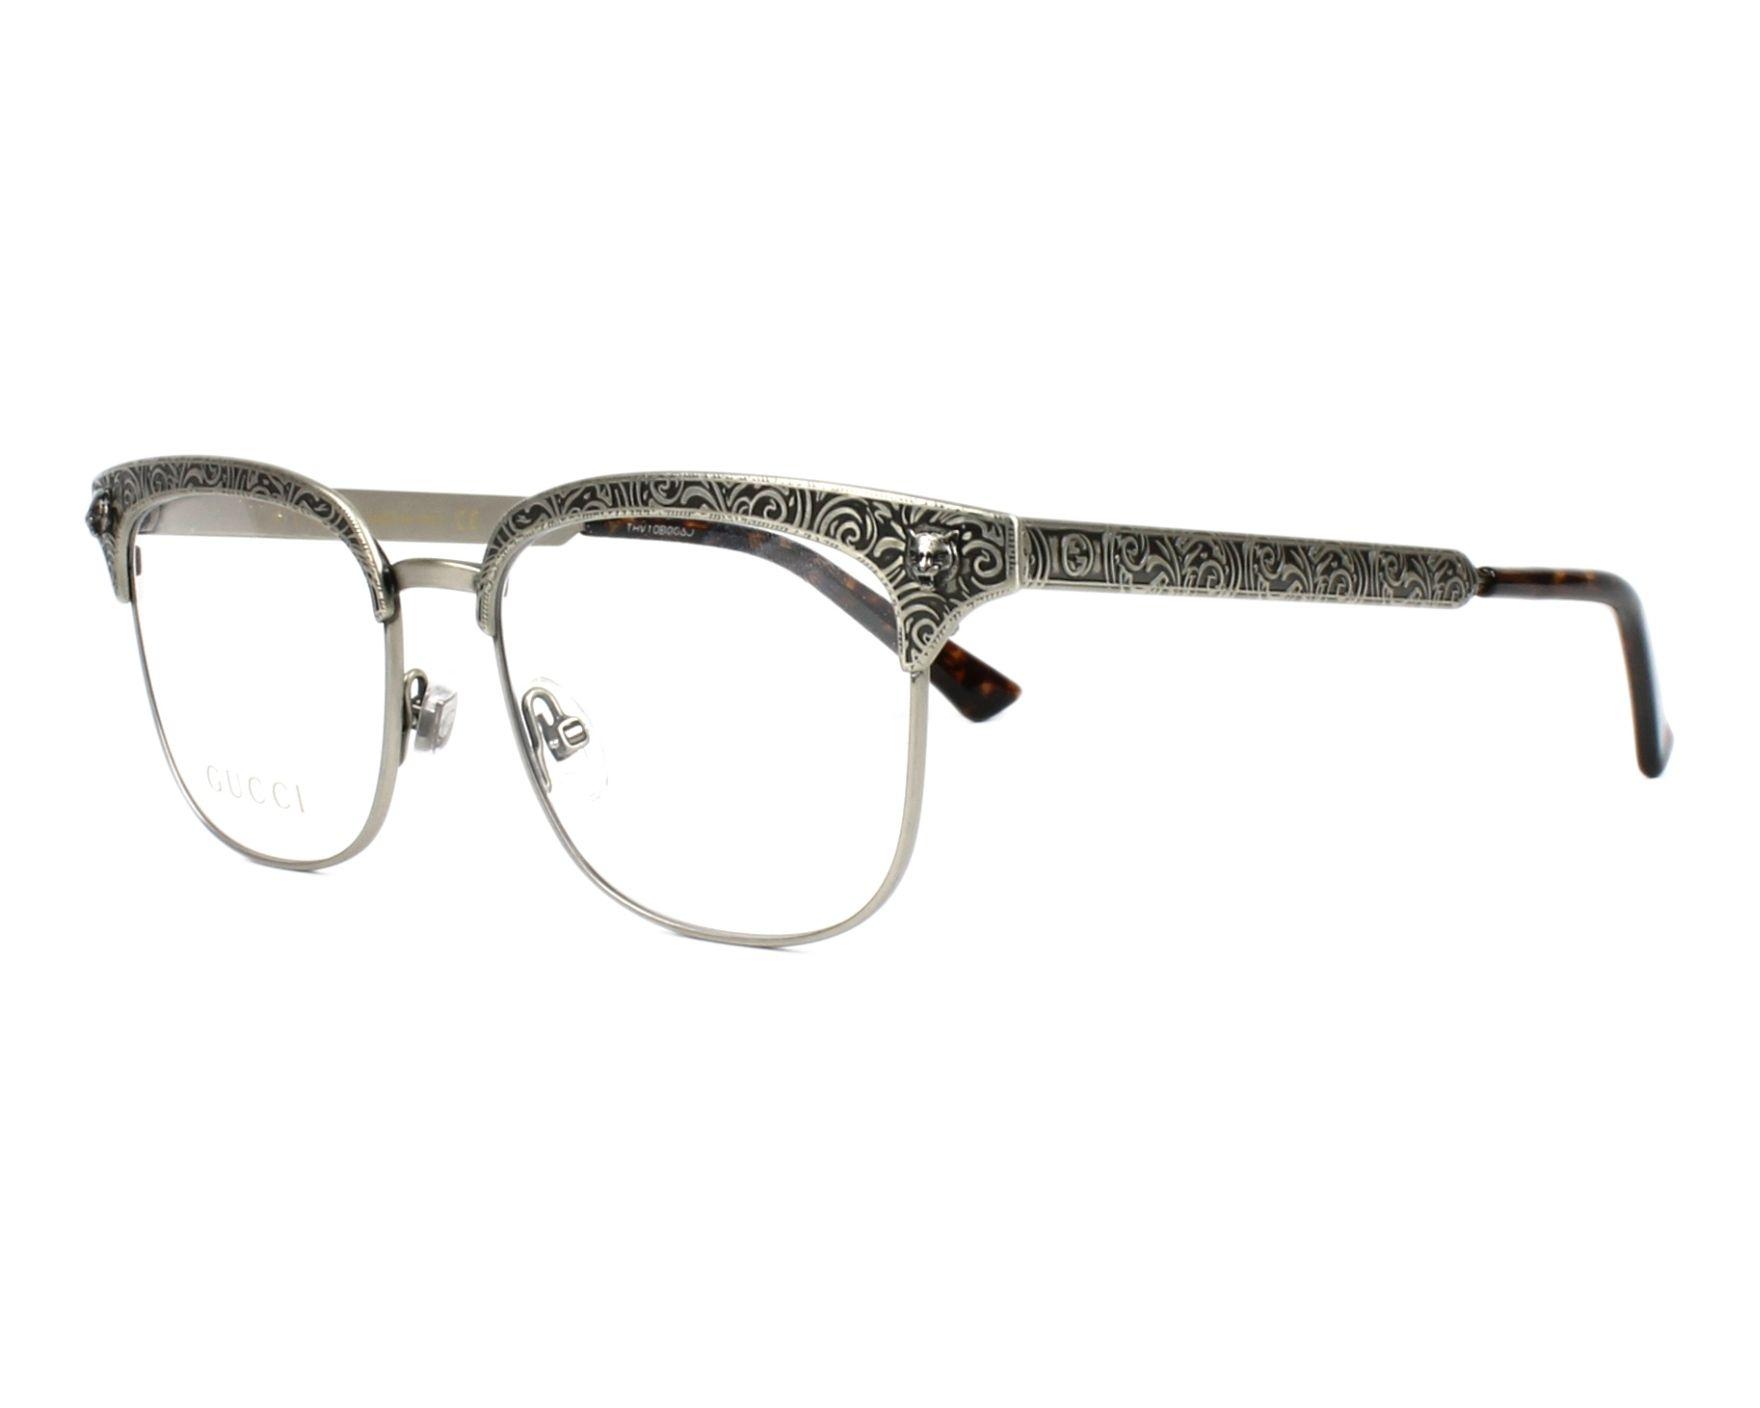 45cc5efa7db eyeglasses Gucci GG-0221-O 002 49-16 Silver Silver profile view